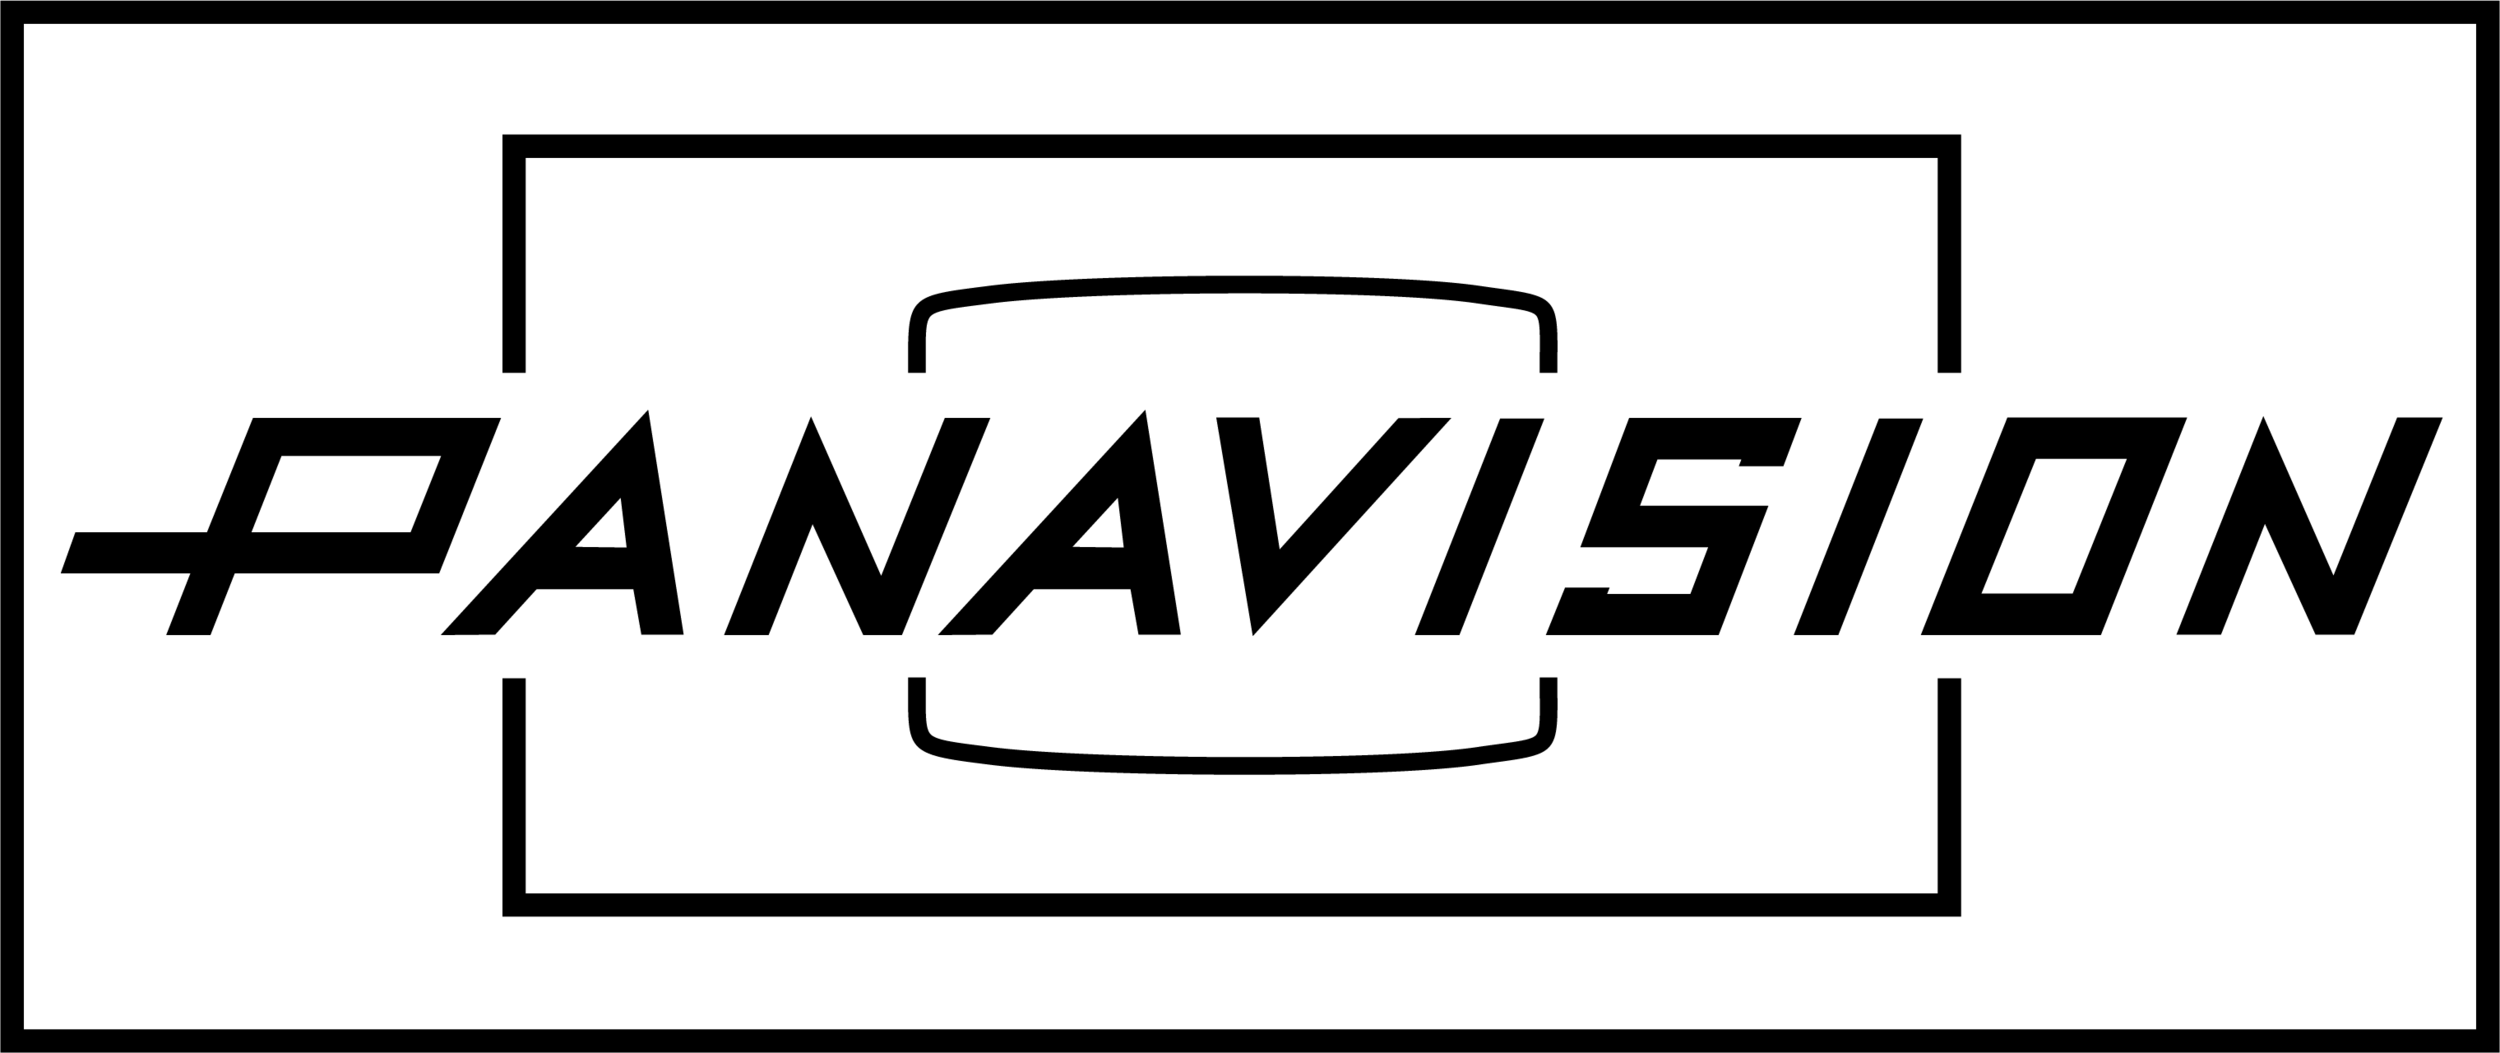 Panavision_GG_logo_black.png